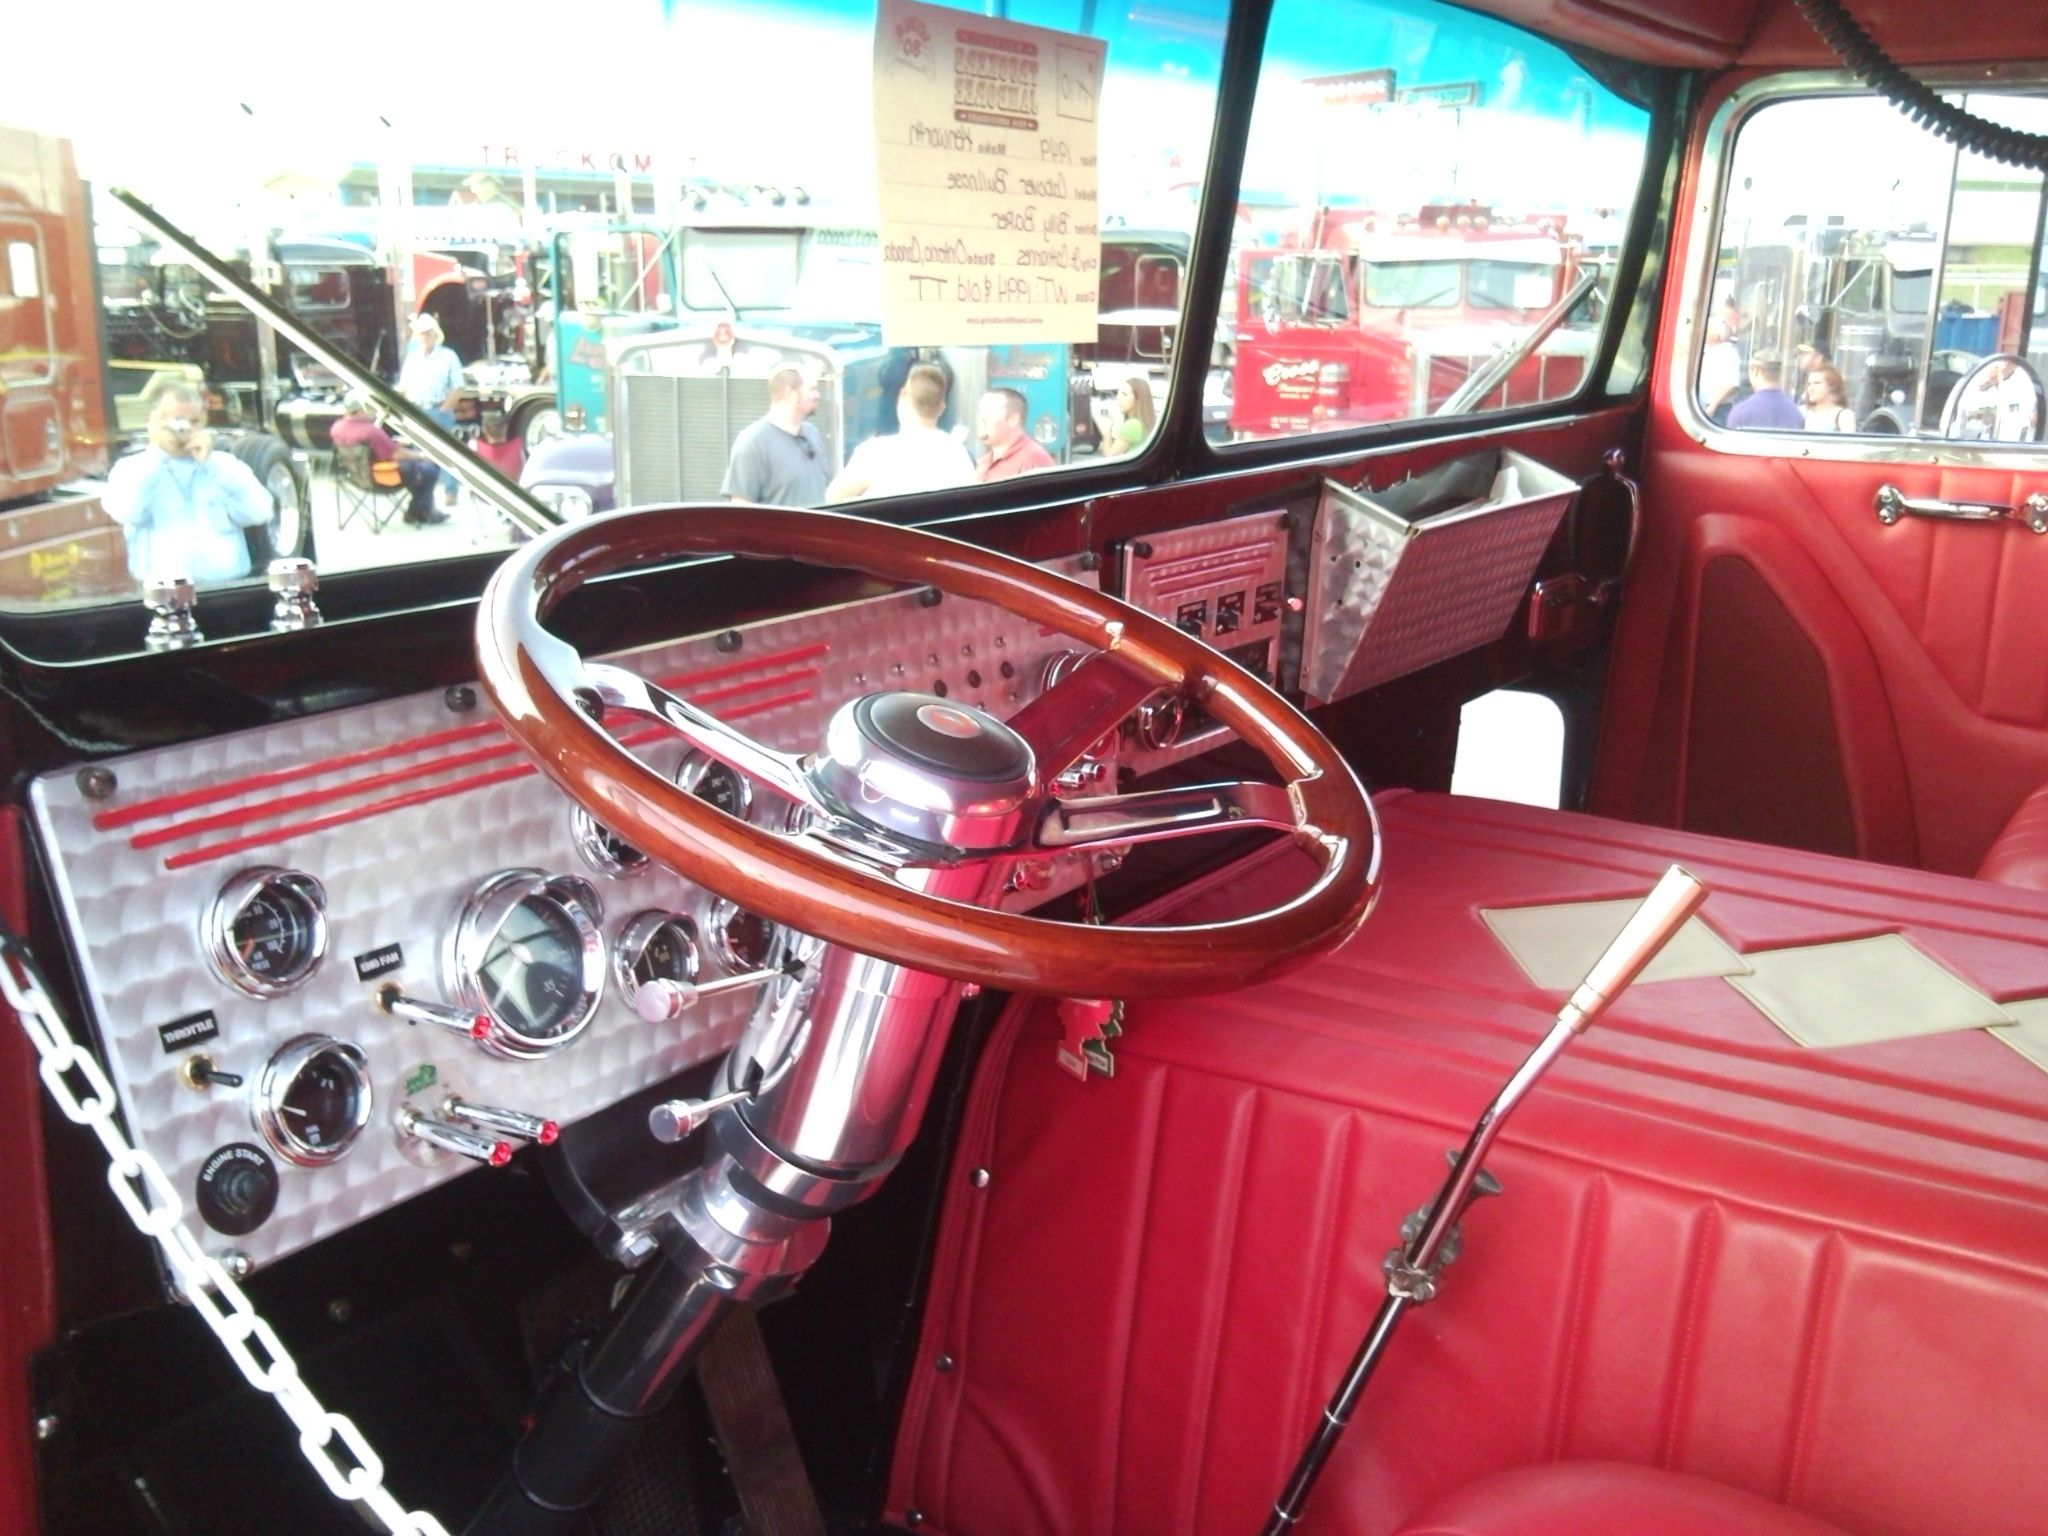 1950 39 S Bubble Nose Kenworth Interior Trucks Pinterest Rigs Truck Interior And Wheels